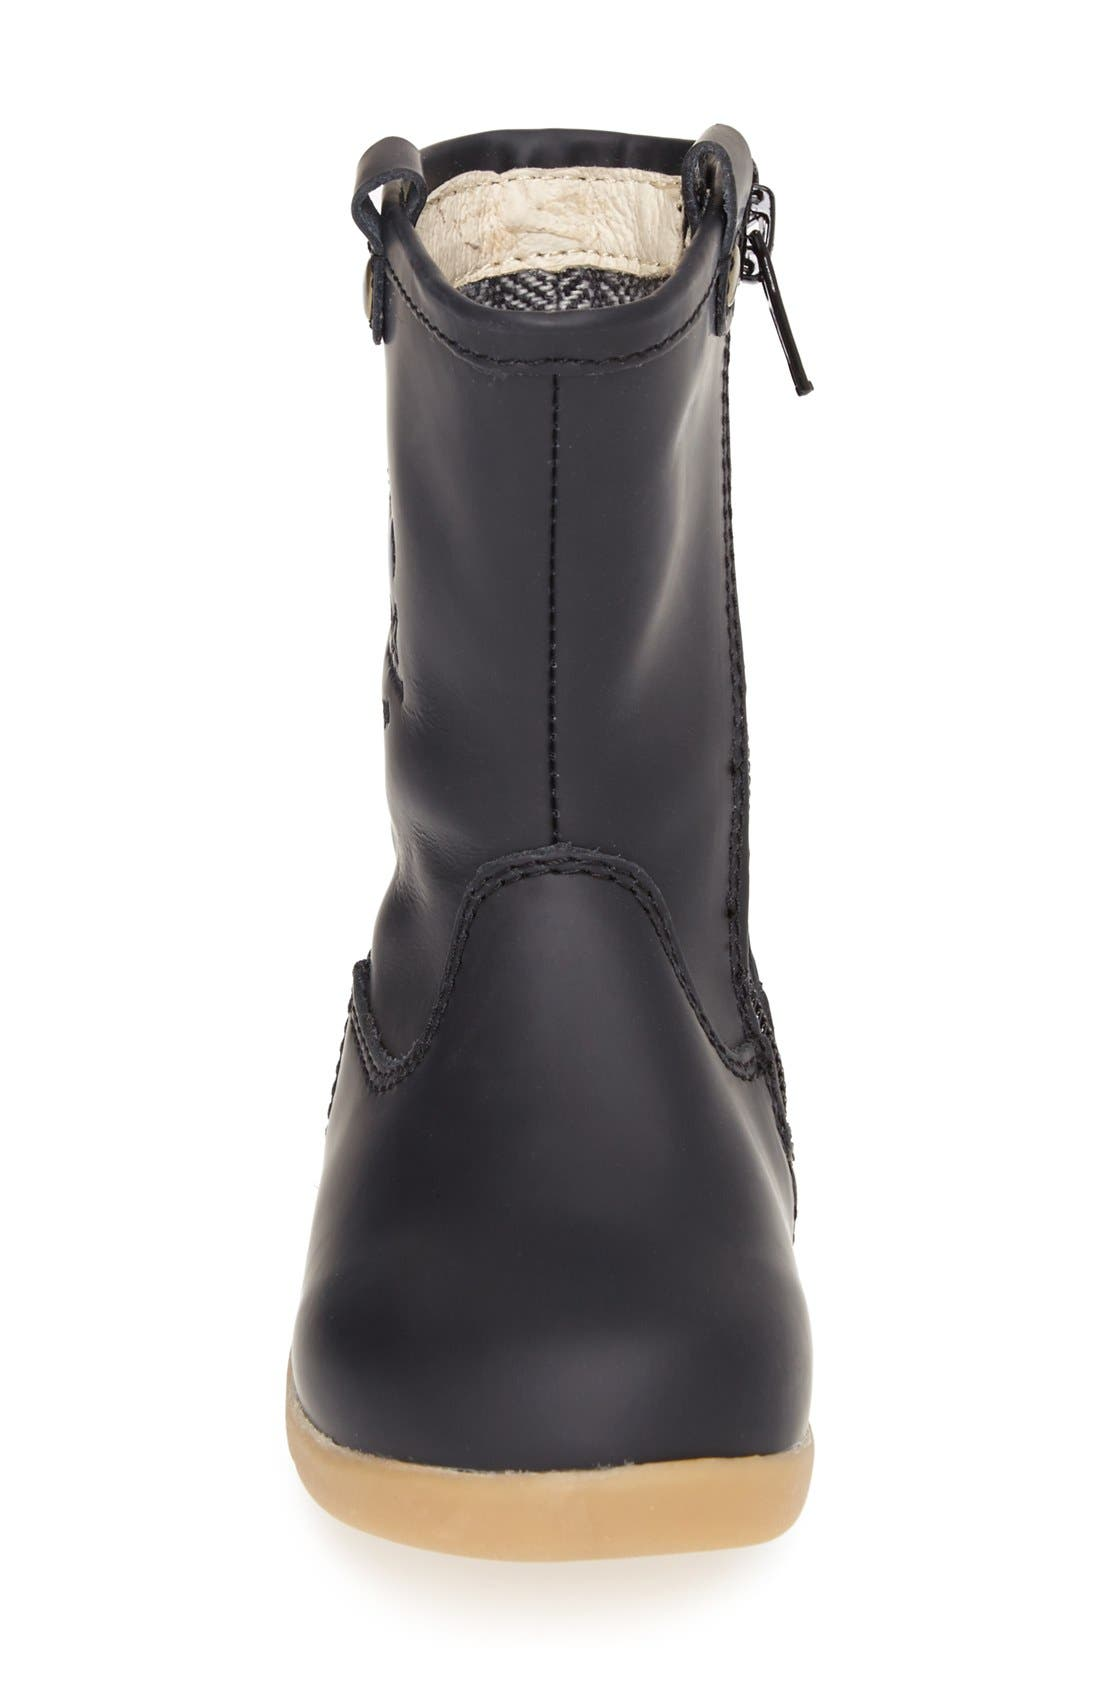 'I-Walk - Splash' Waterproof Rain Boot,                             Alternate thumbnail 3, color,                             001